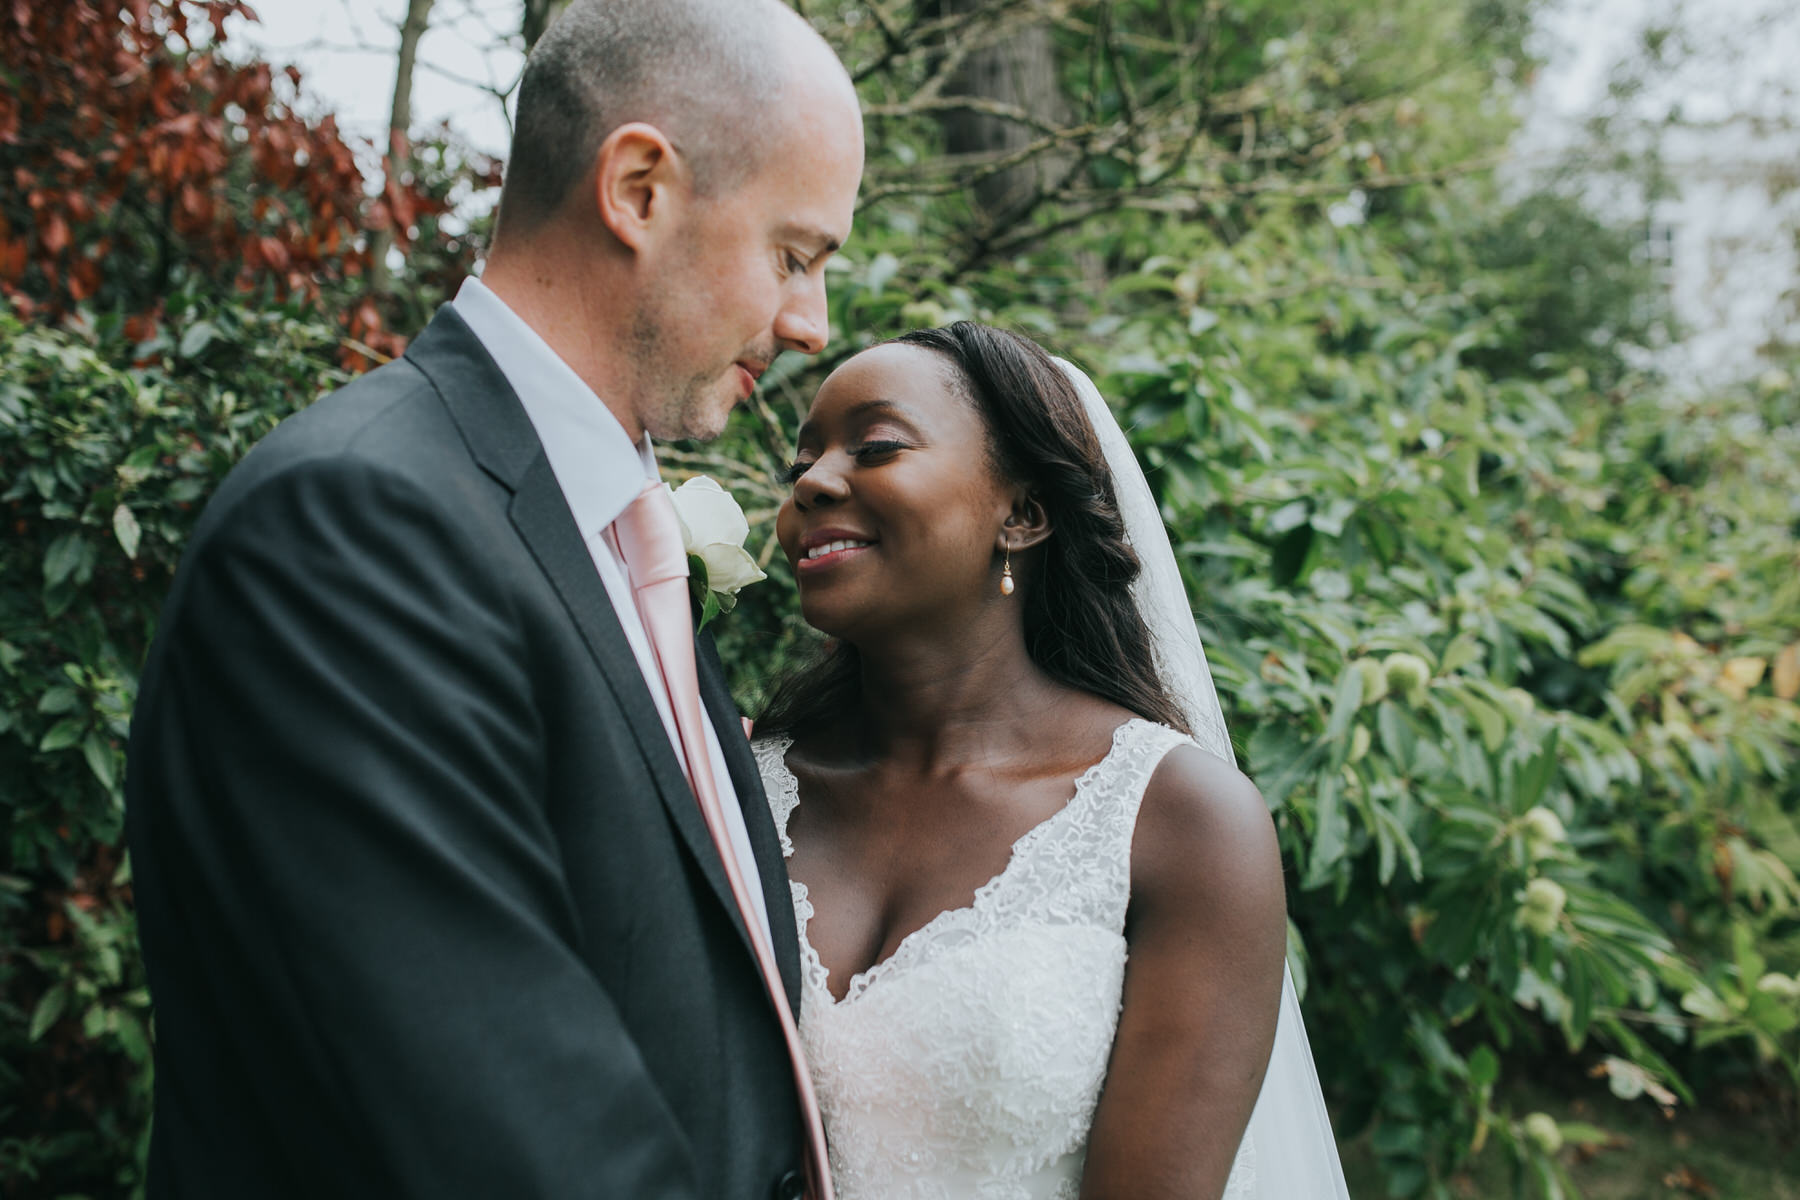 180 intimate groom bride wedding portraits Dulwich wedding.jpg